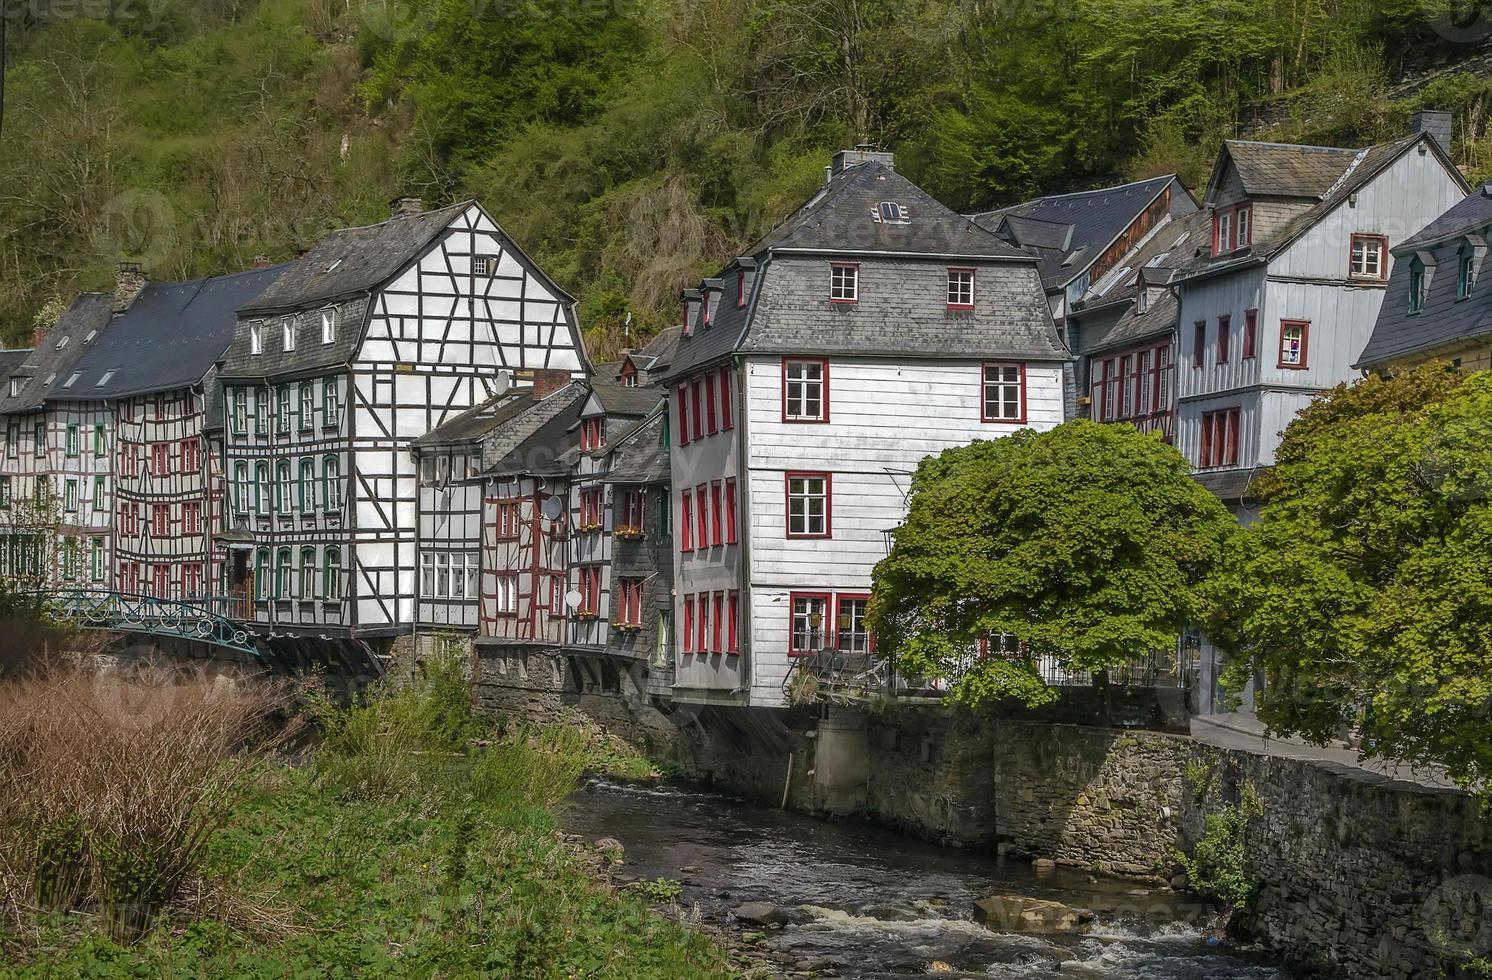 Houses along the Rur river, Monschau, Germany photo